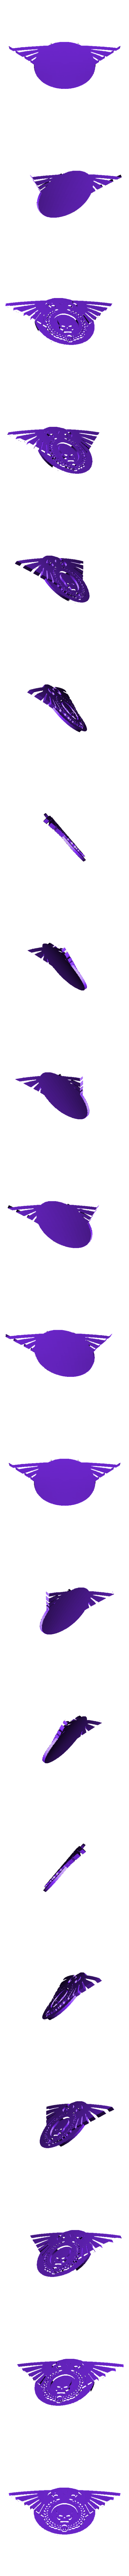 ROGUE_TRADER_V2.stl Download free STL file Logo Pack - Carapace • Design to 3D print, yaemhay